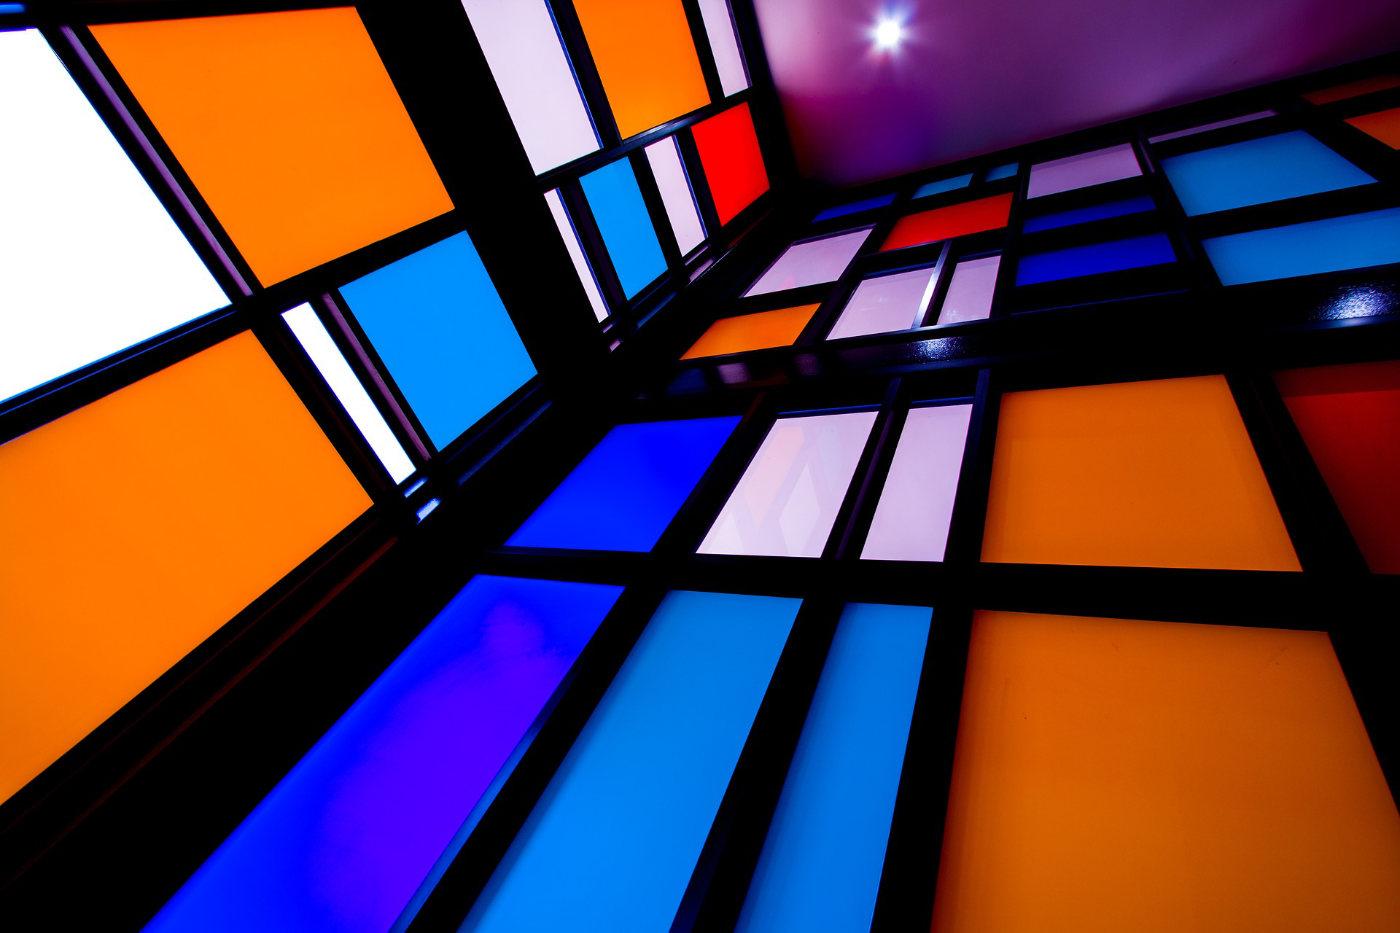 Coloured Mondrian-style glass in blues & orange in black frames